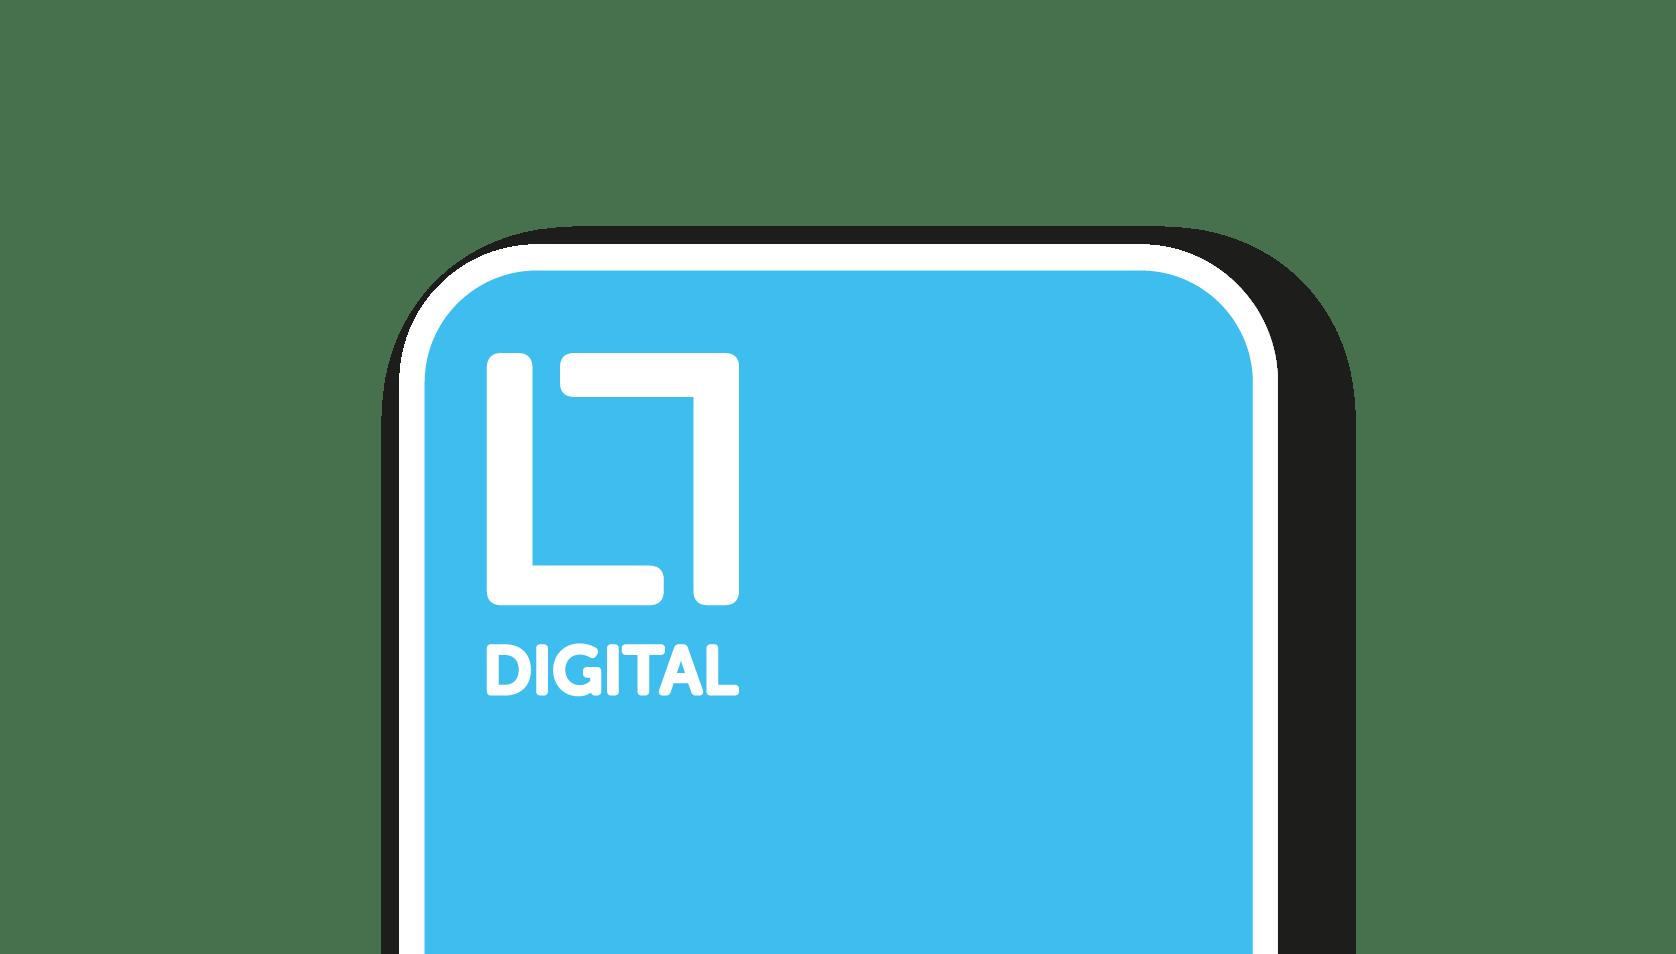 A secondary, flexible mark for digital marketing agency based in Loughborough, limelight digital.